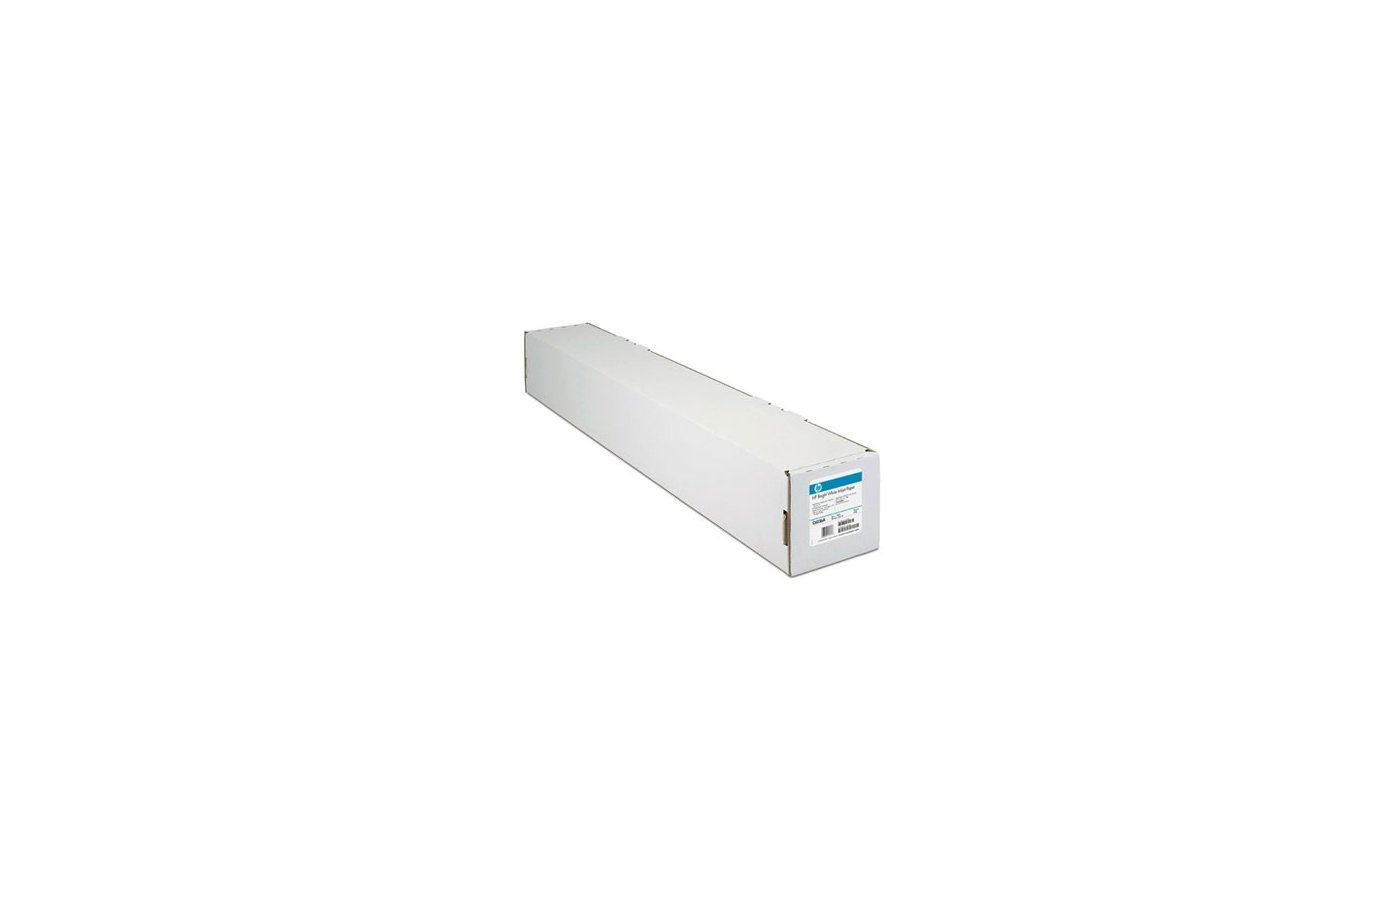 "Бумага HP Q1446A 17""/420мм х 45.7м/90г/м2/рул. с покрытием для струйной печати ярко-белая"